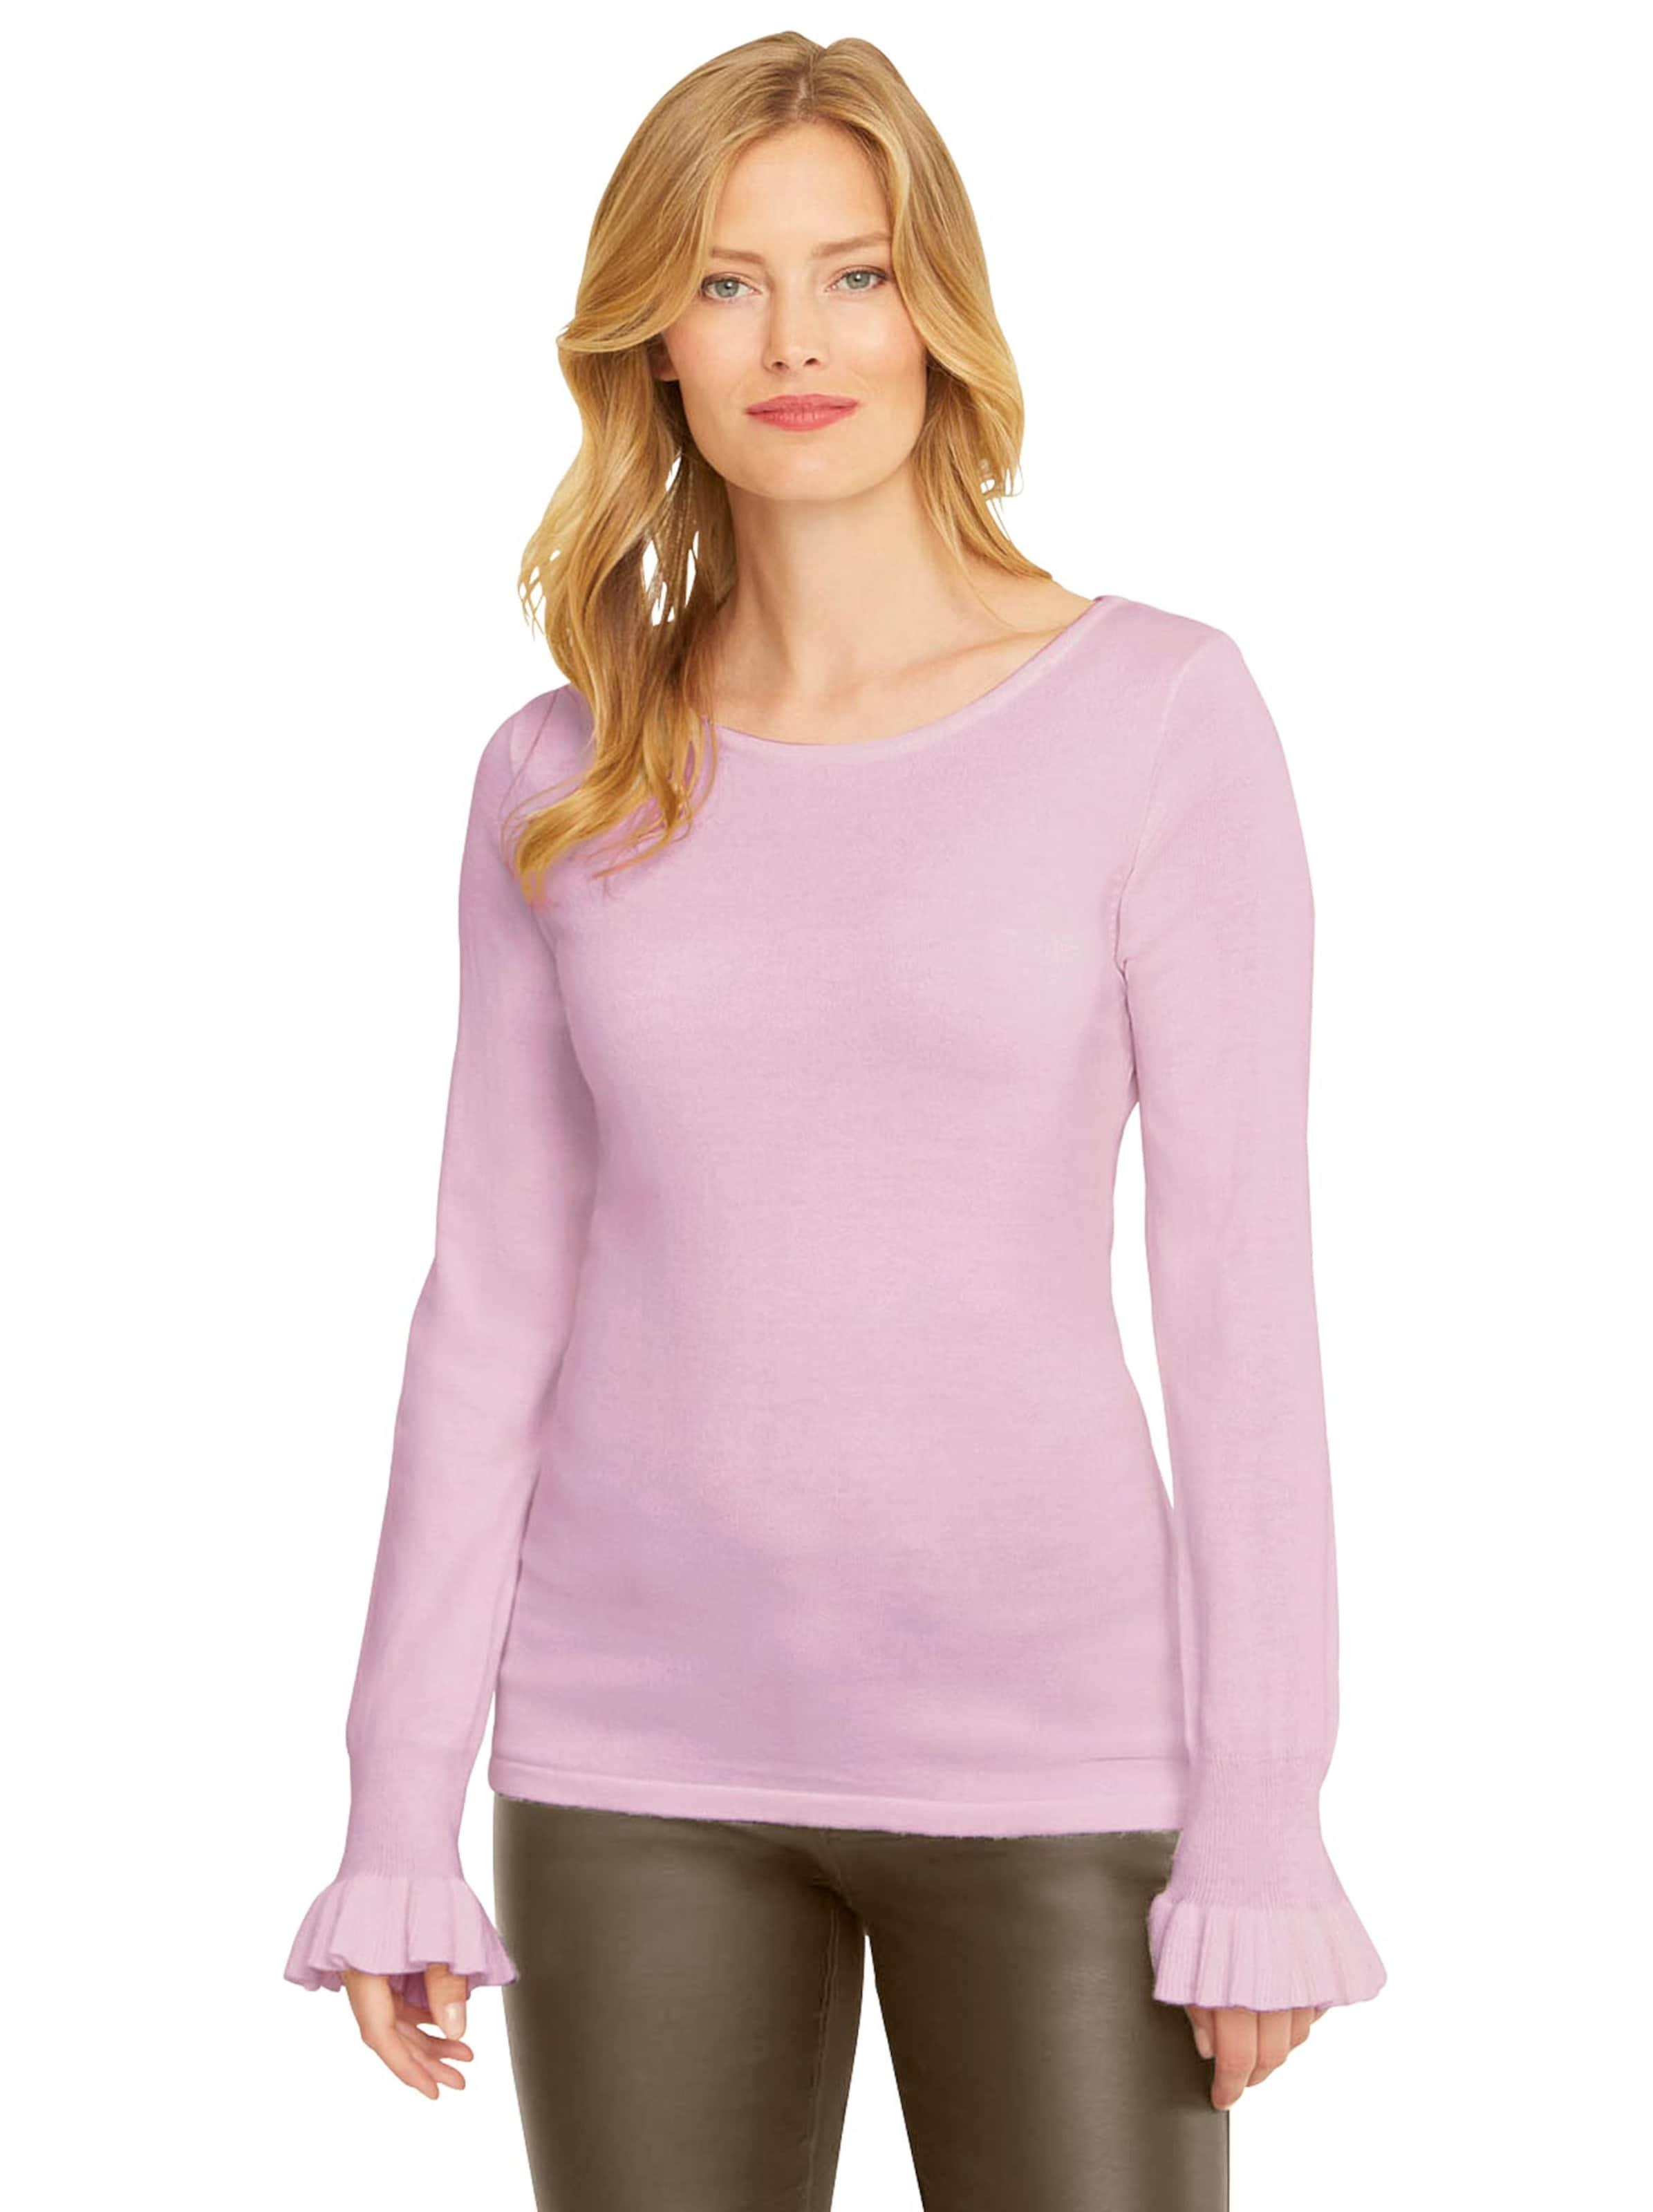 ashley brooke - Damen Pullover rosé